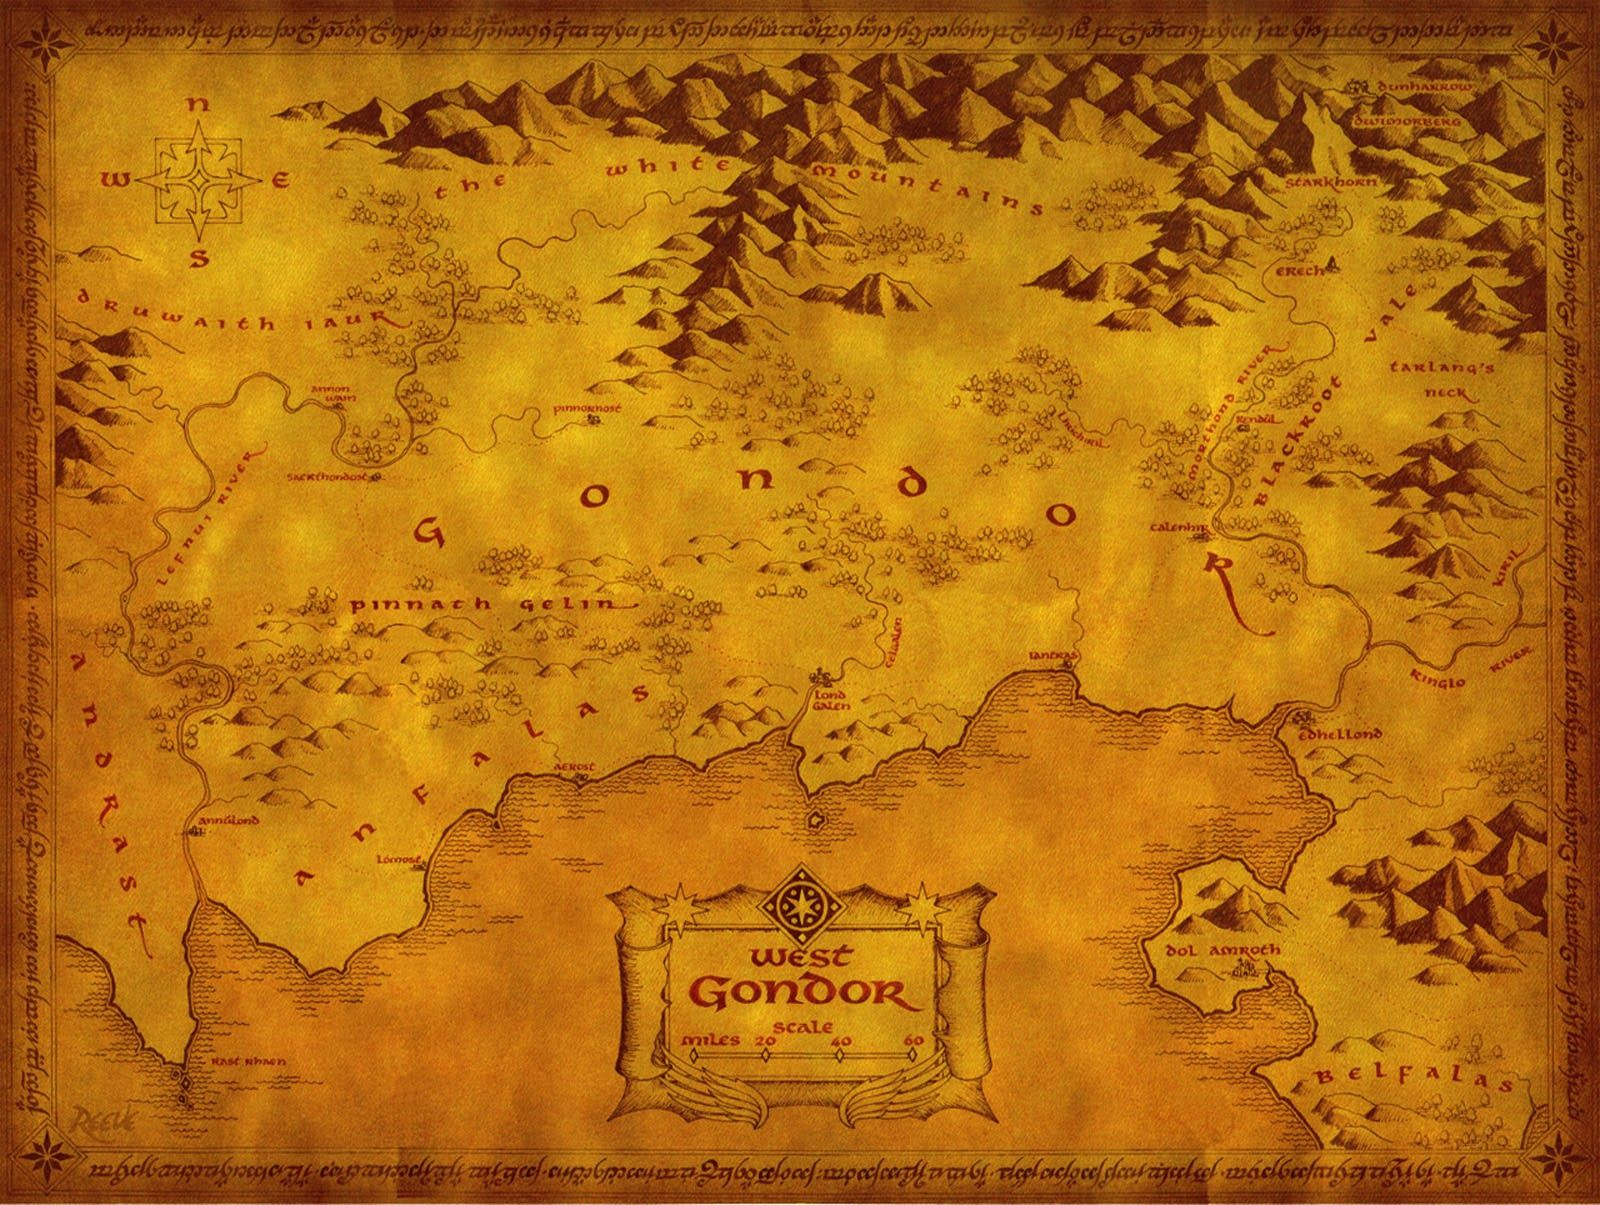 Mapa Tierra Media Hd.Mapa Tierra Media Hd Mapa